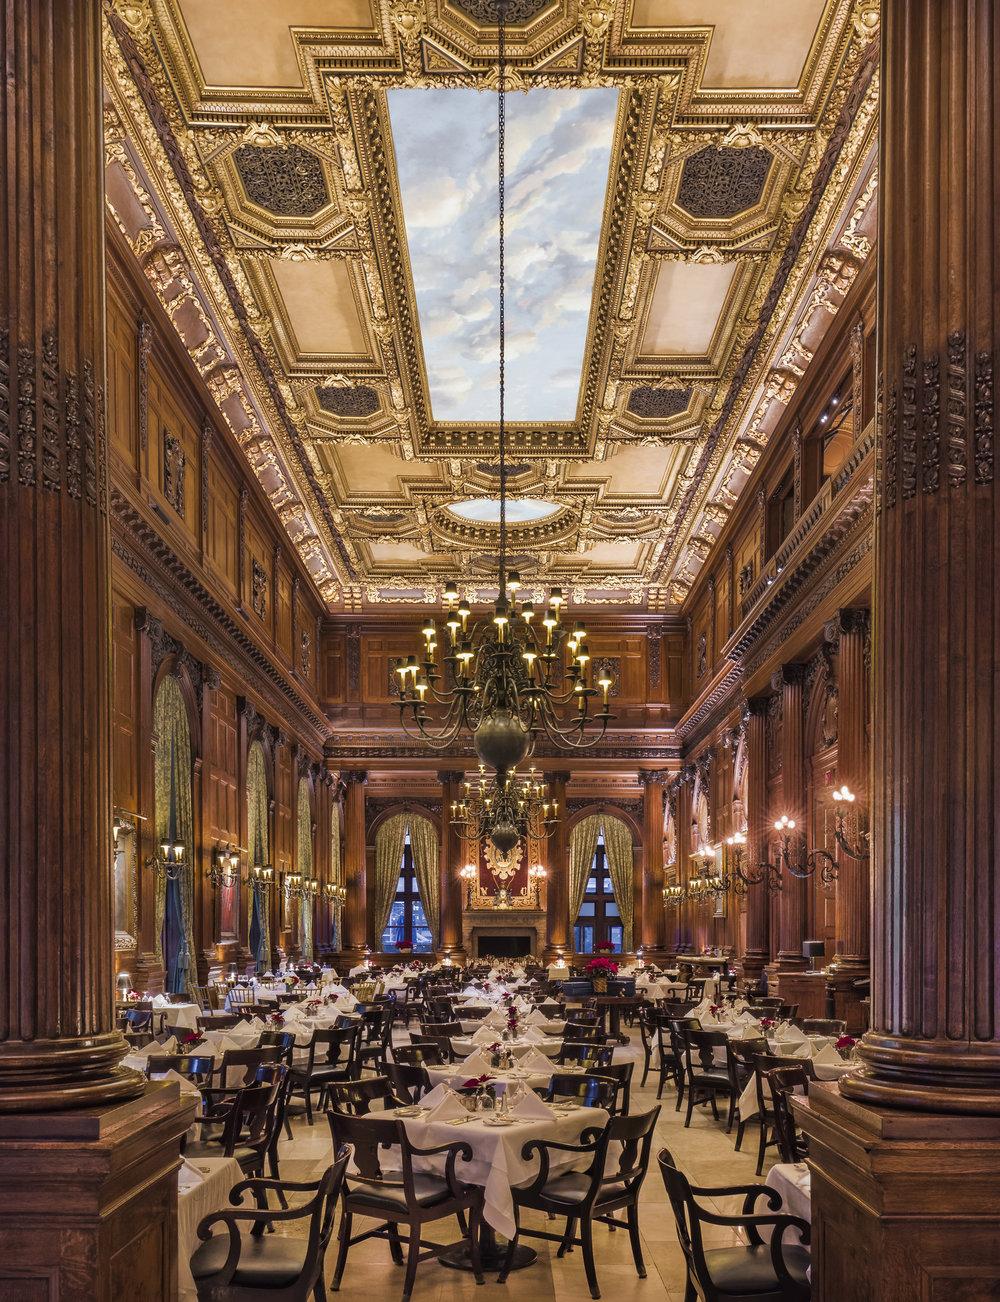 Private Club Dining Room, Location: New York, New York, Lighting